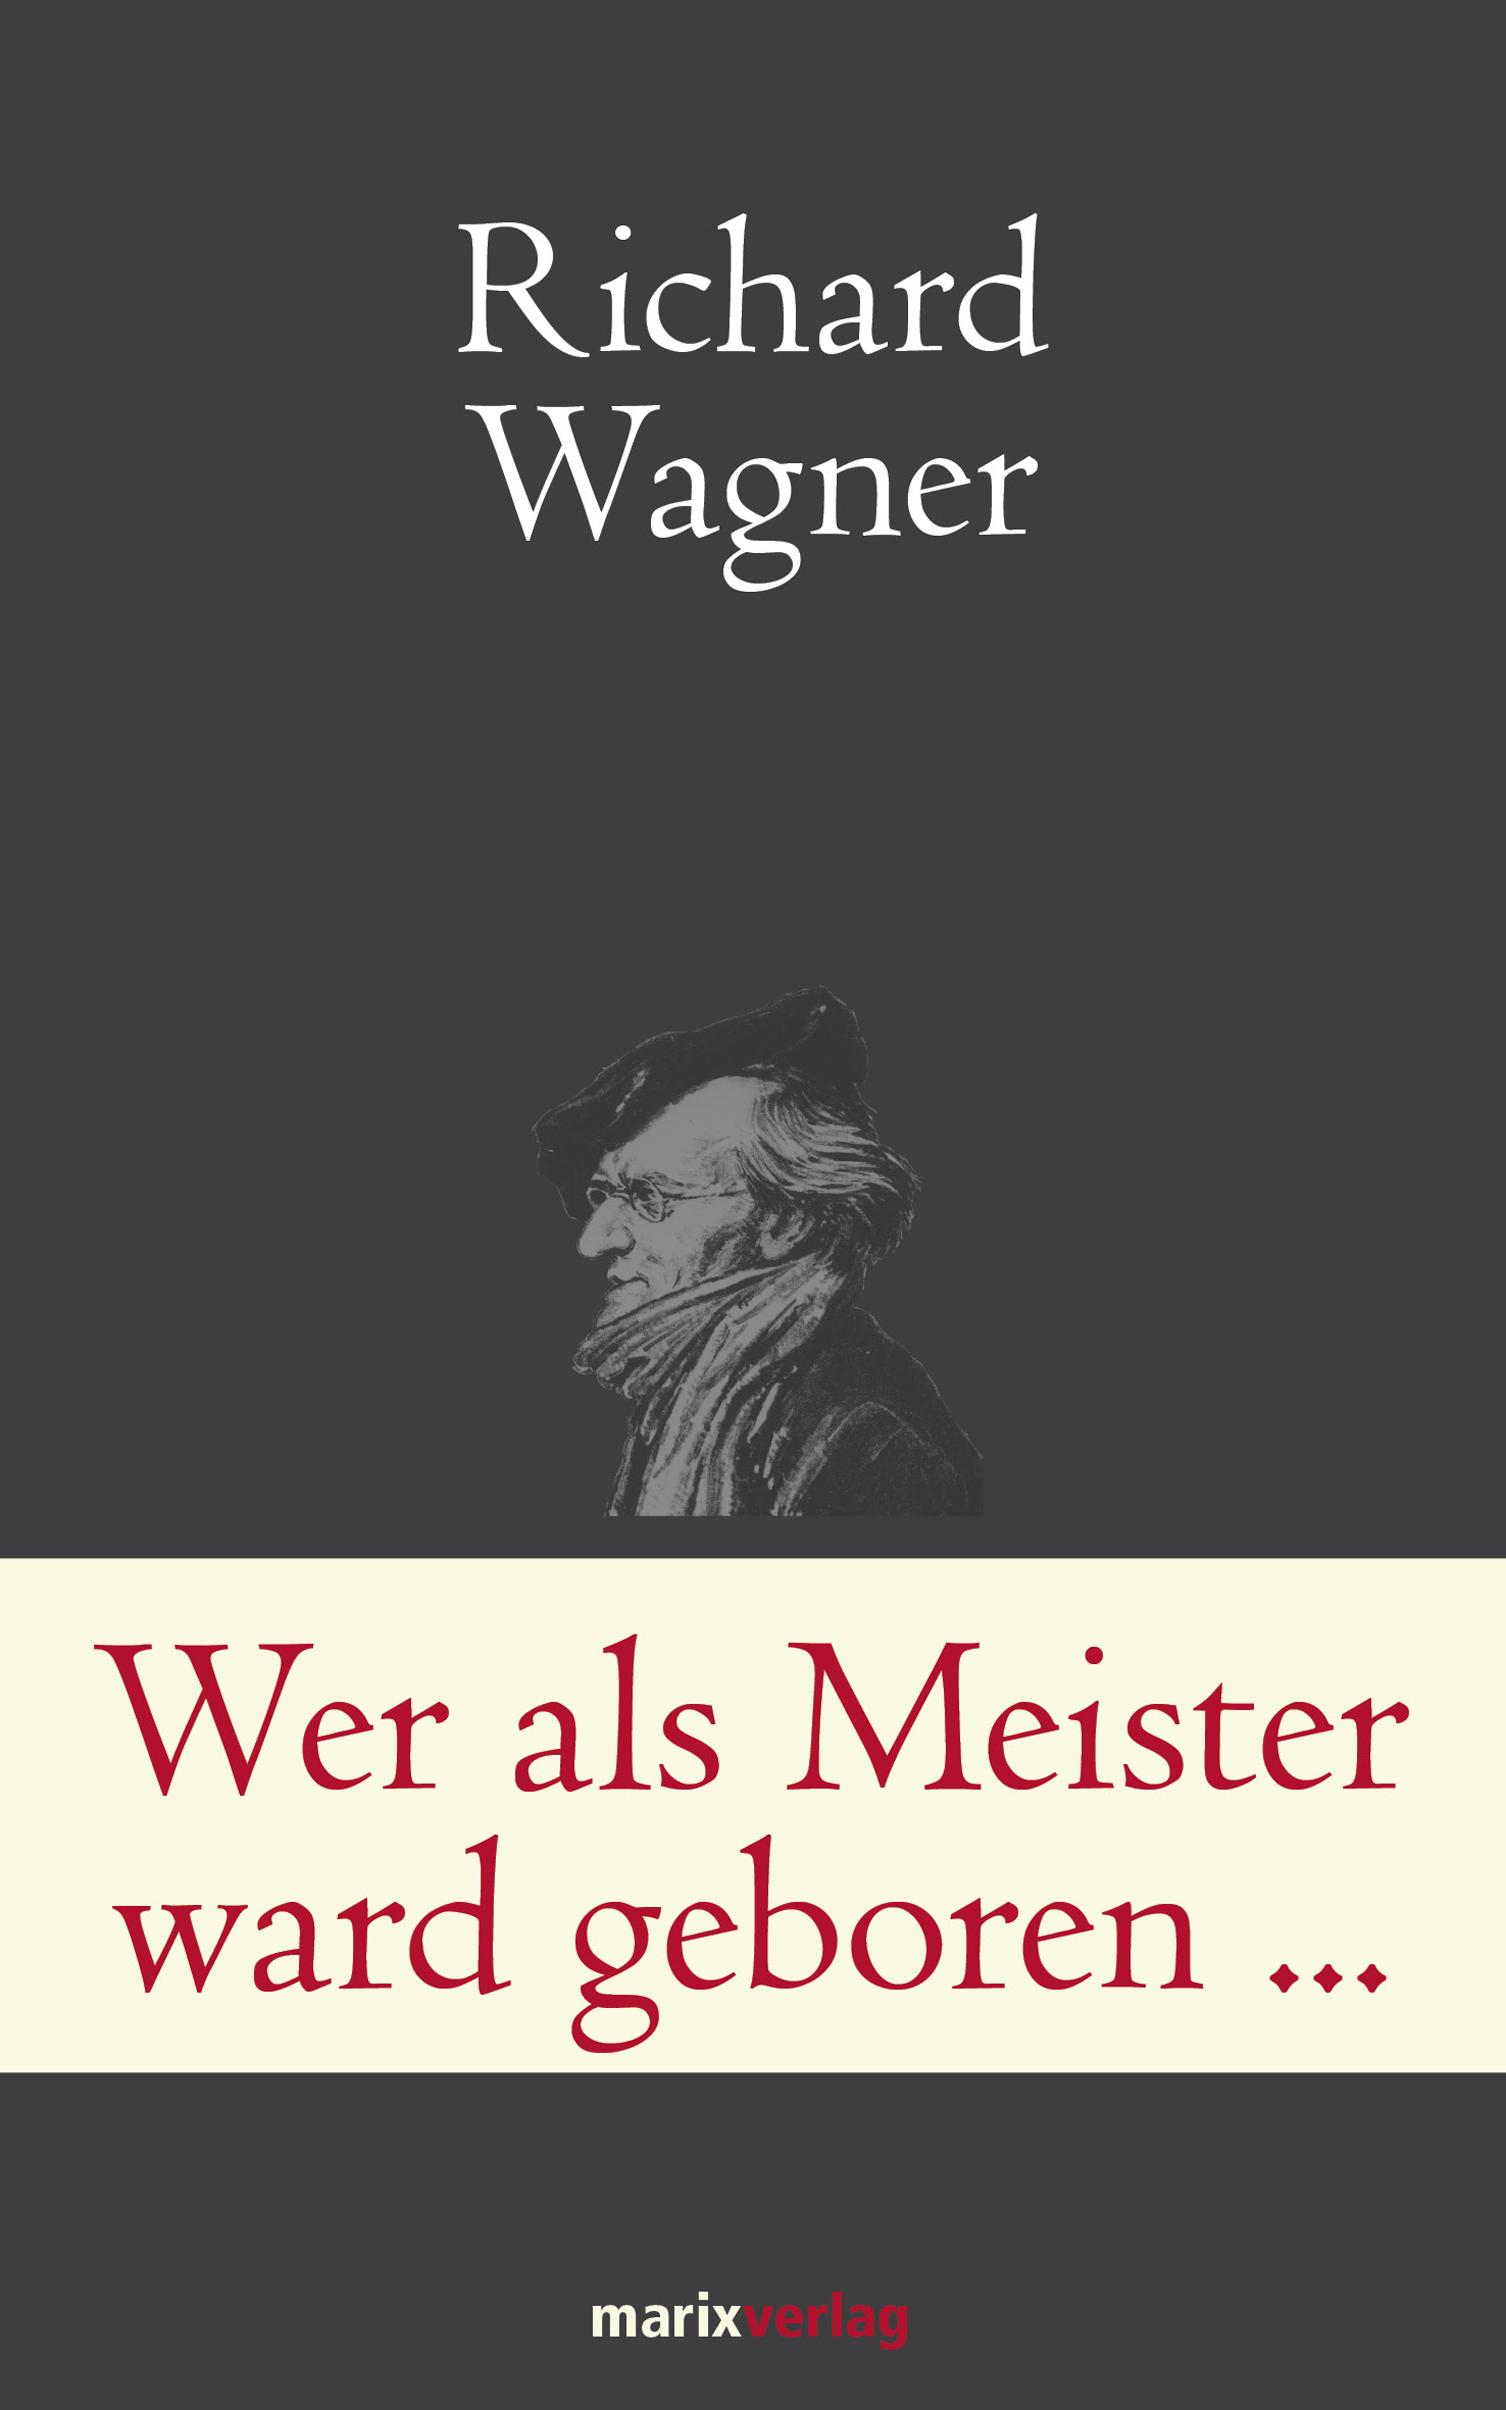 Richard Wagner Wer als Meister ward geboren… richard wagner beethoven